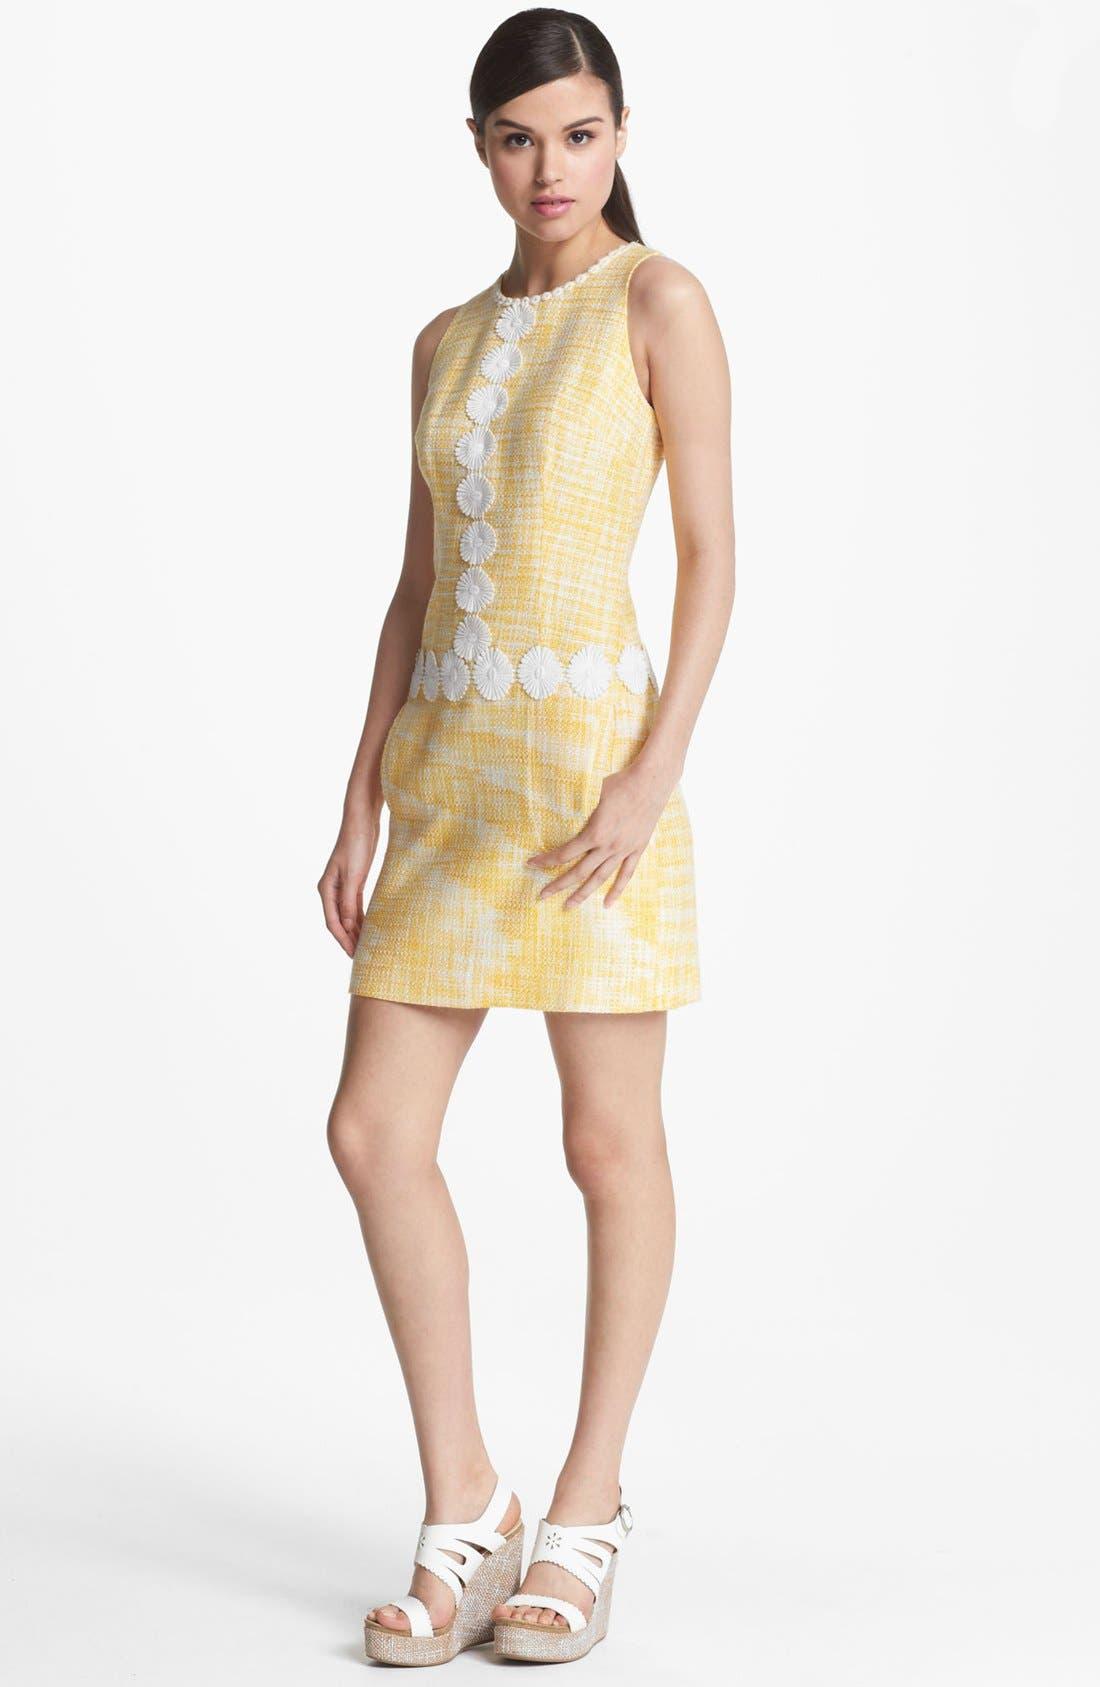 Alternate Image 1 Selected - Laundry by Shelli Segal Daisy Trim Bouclé Dress